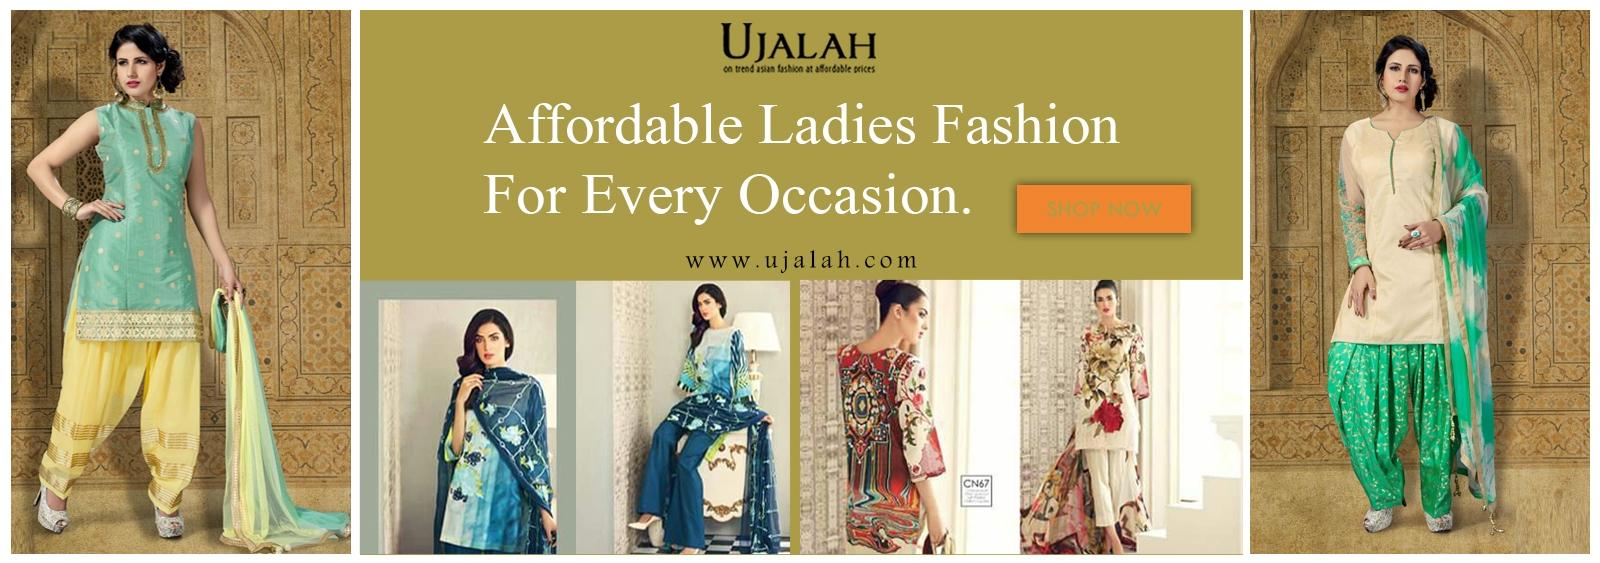 ujalah (@ujalah) Cover Image